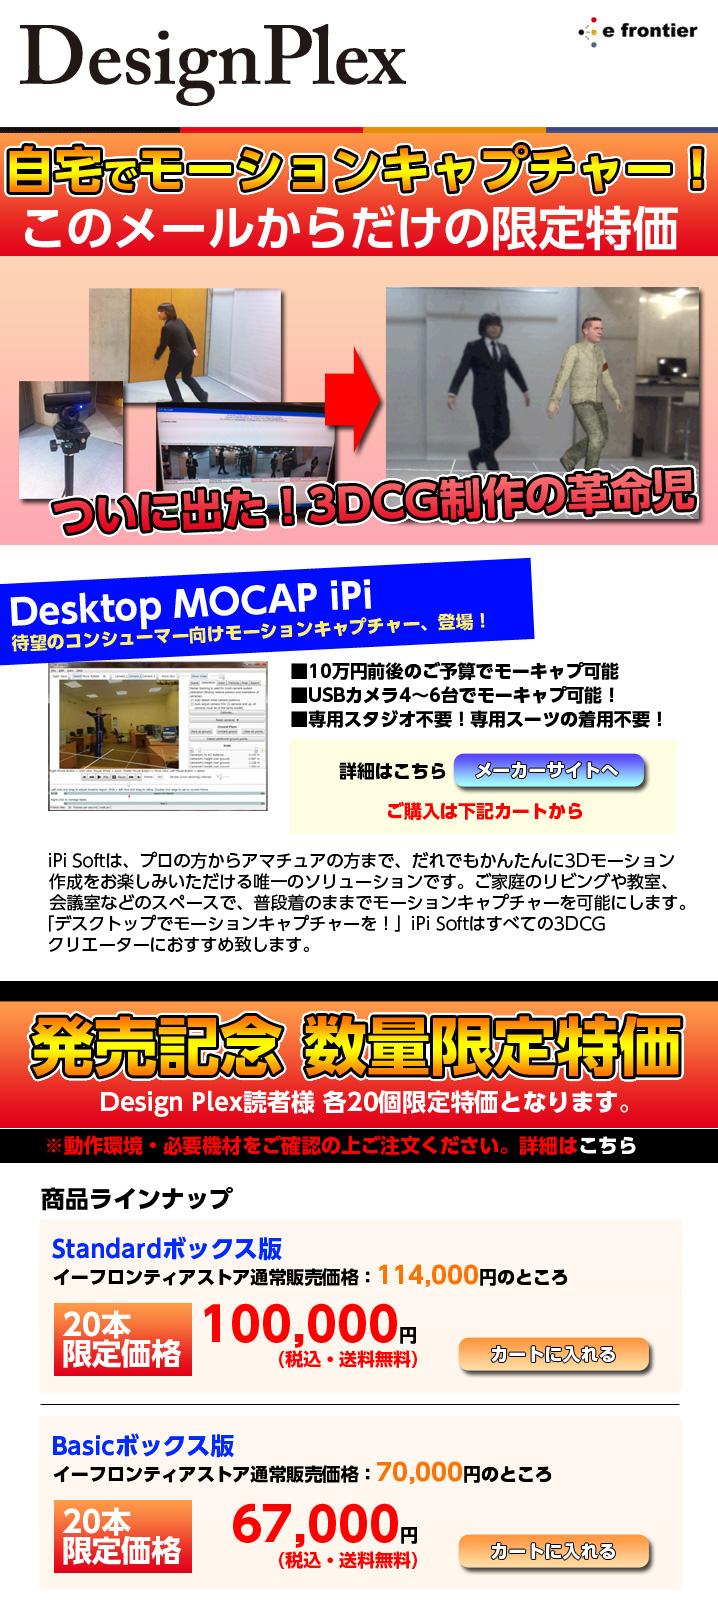 DesignPlex